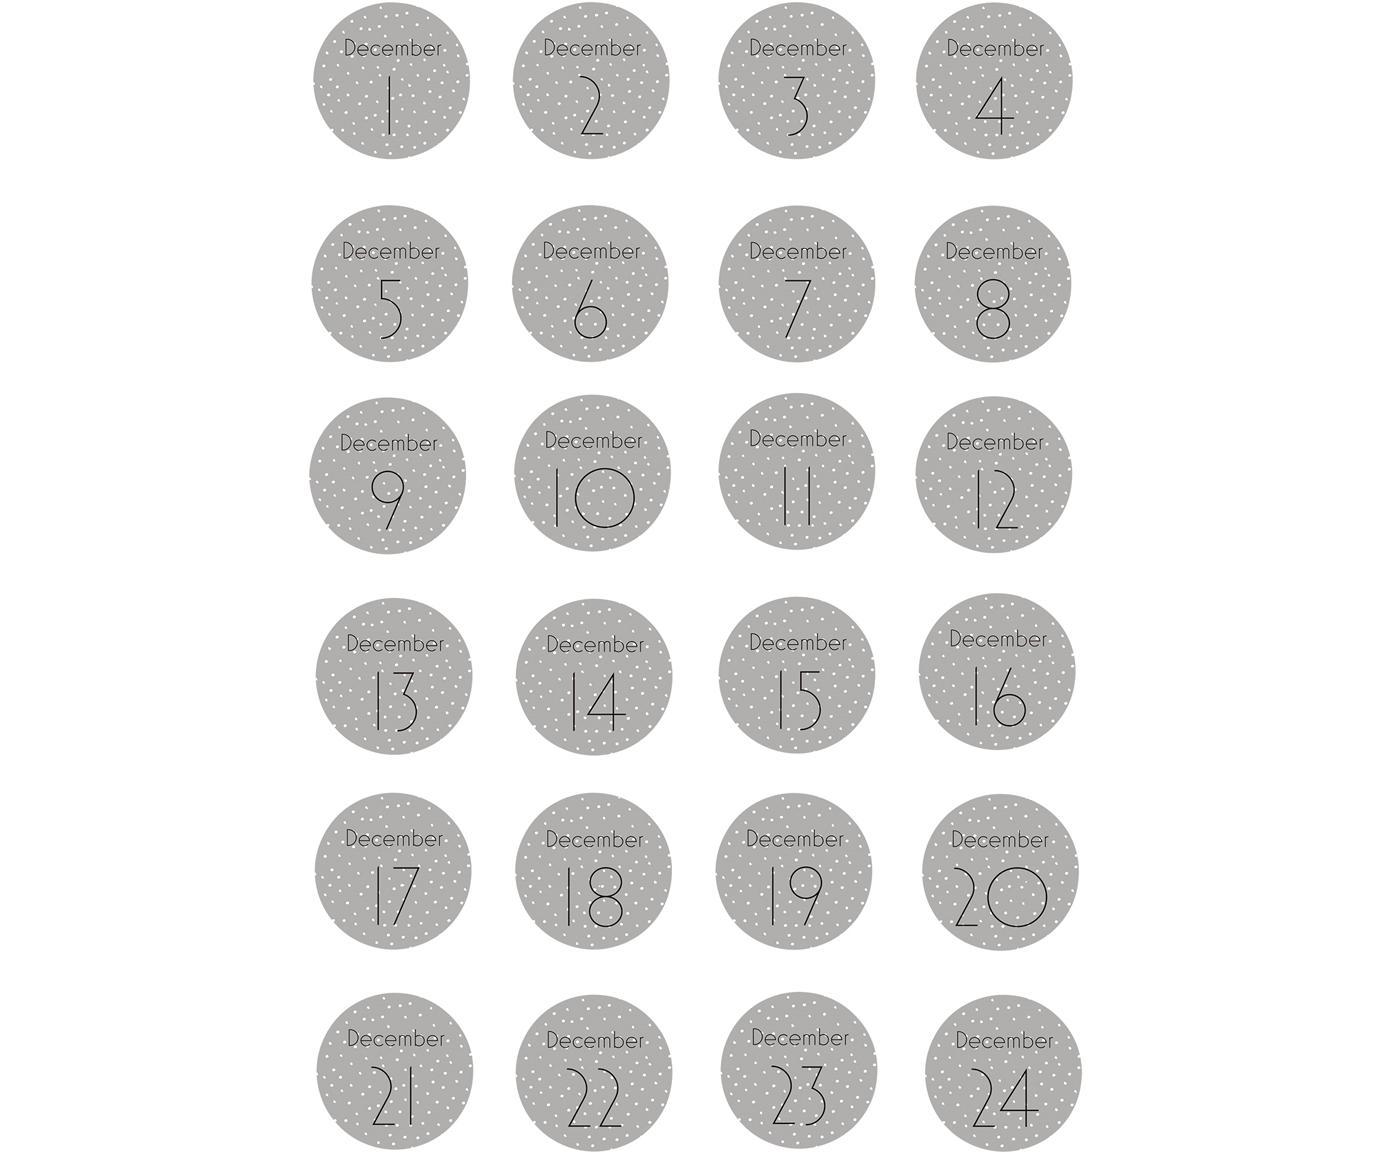 Set 24 adesivi Advent, Carta, Grigio, bianco, nero, Ø 5 cm